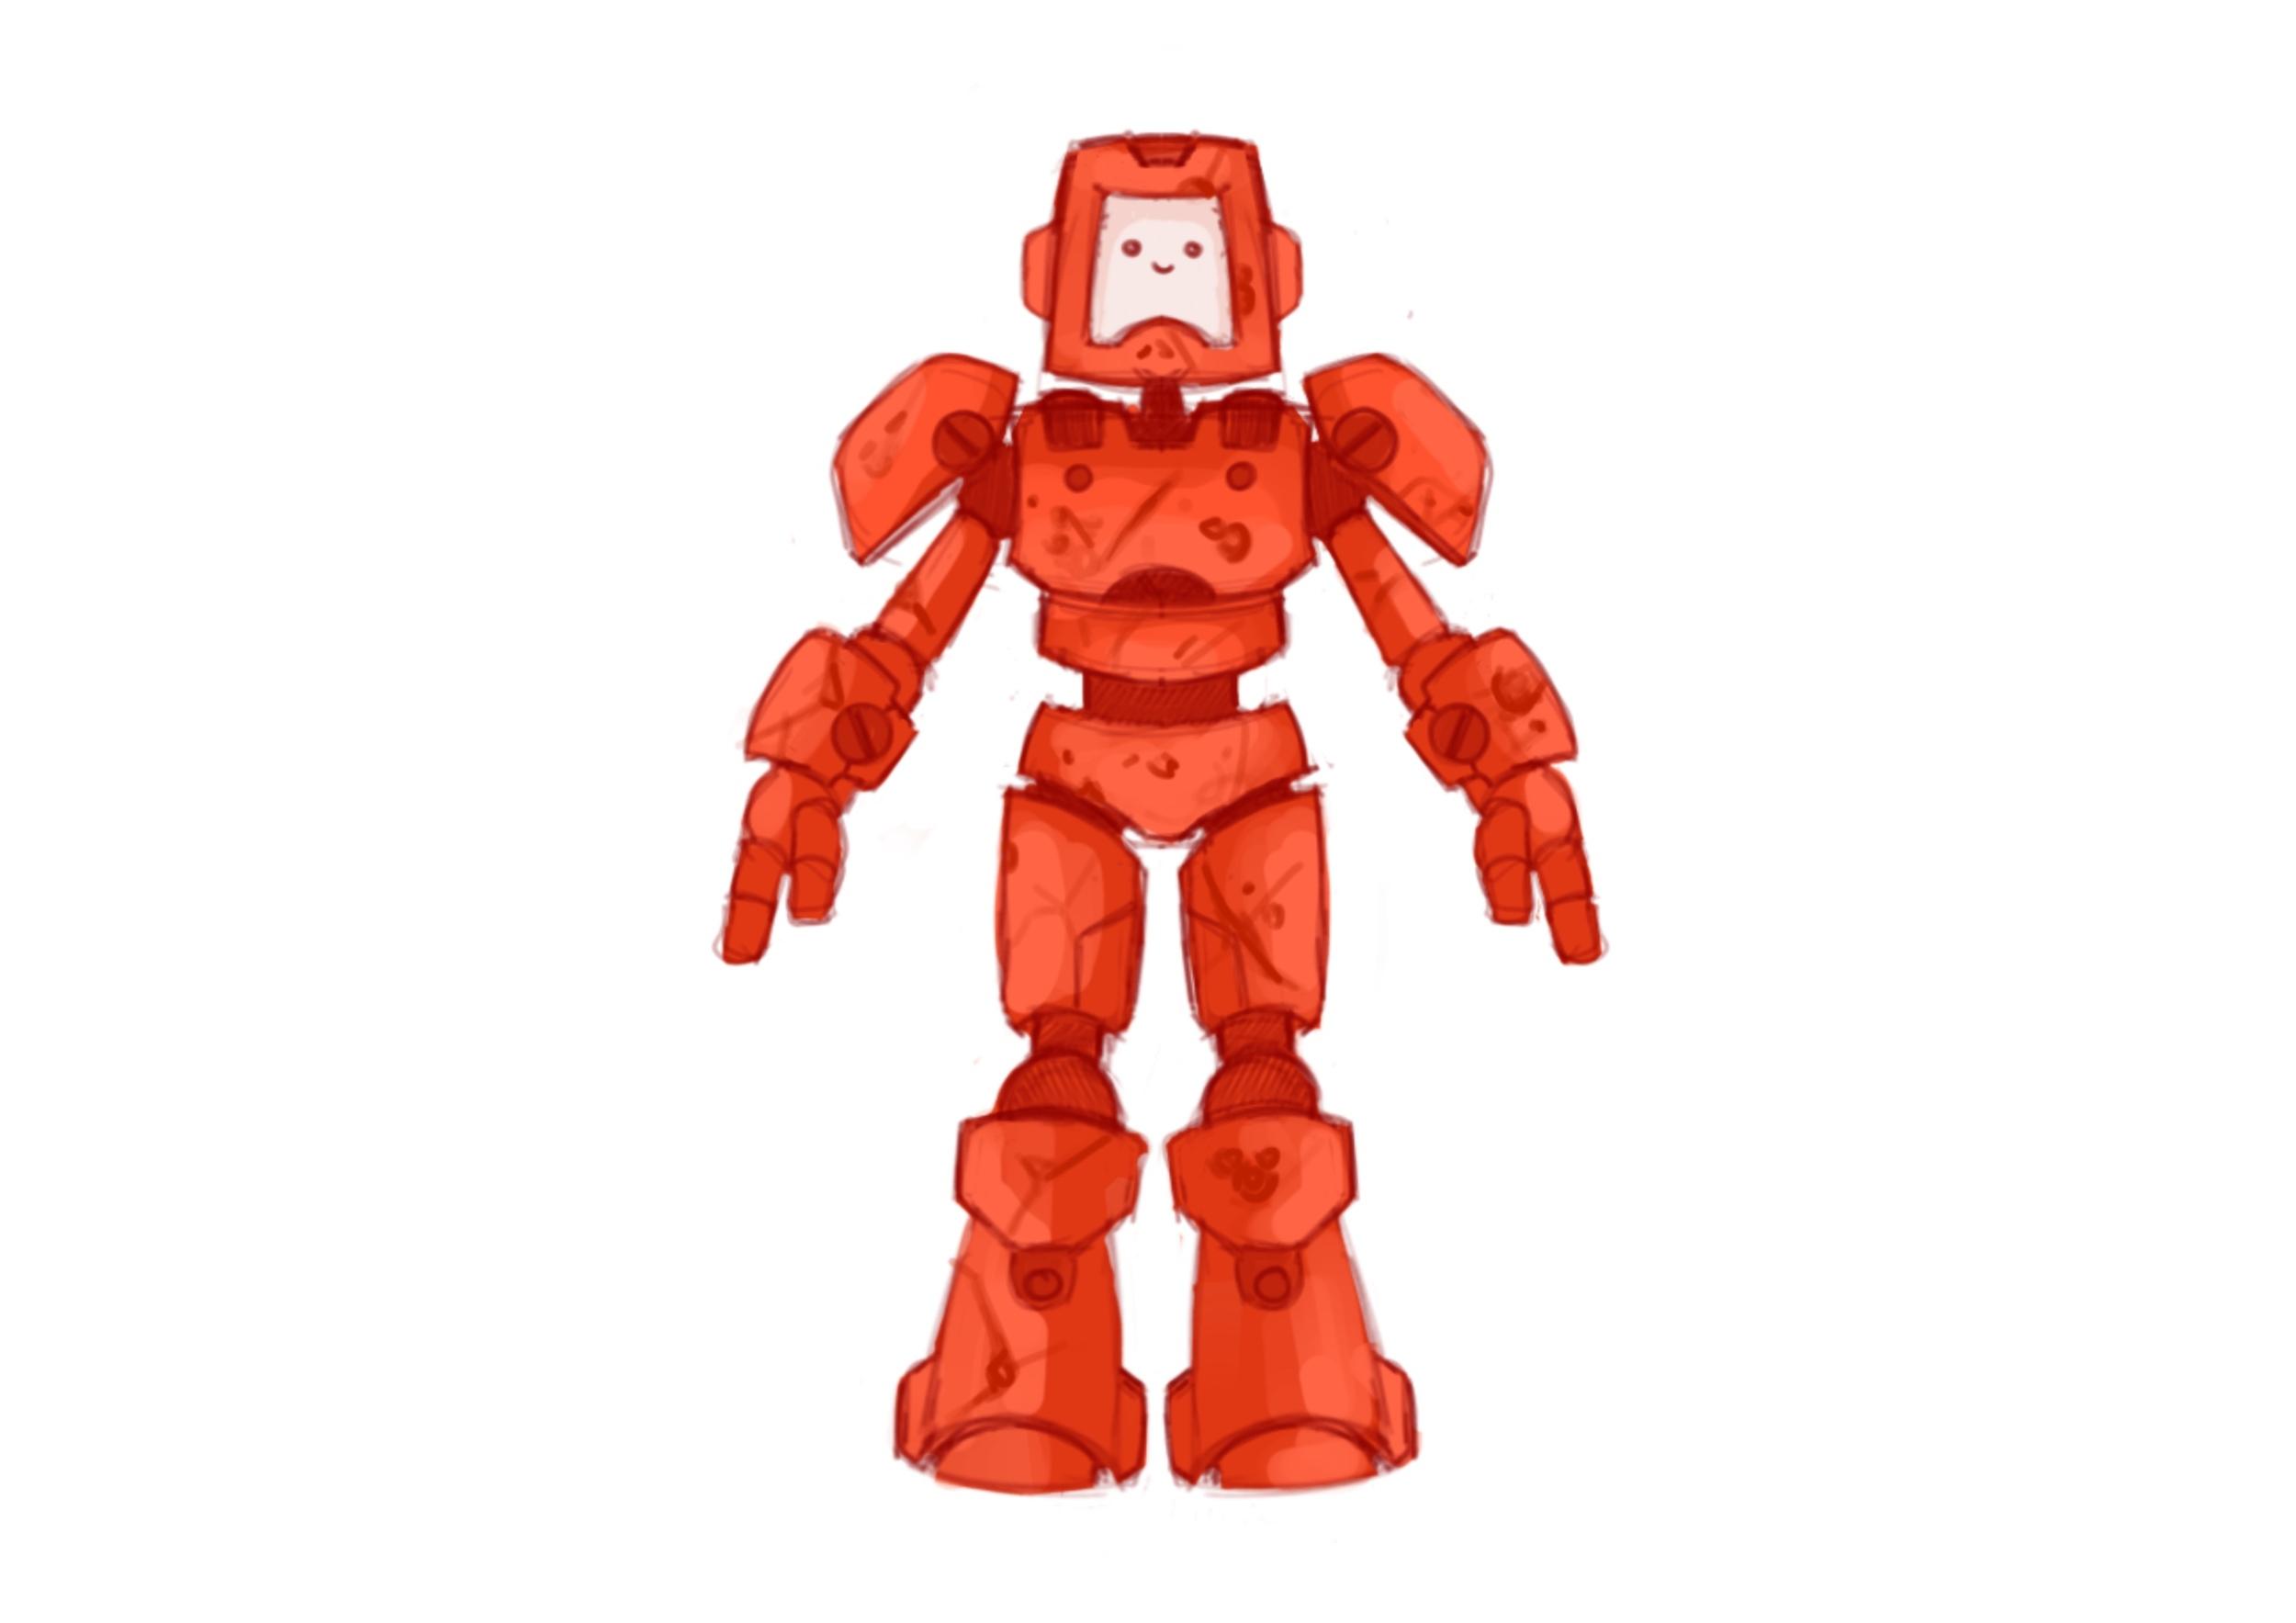 redrobot_dillon.png.jpg